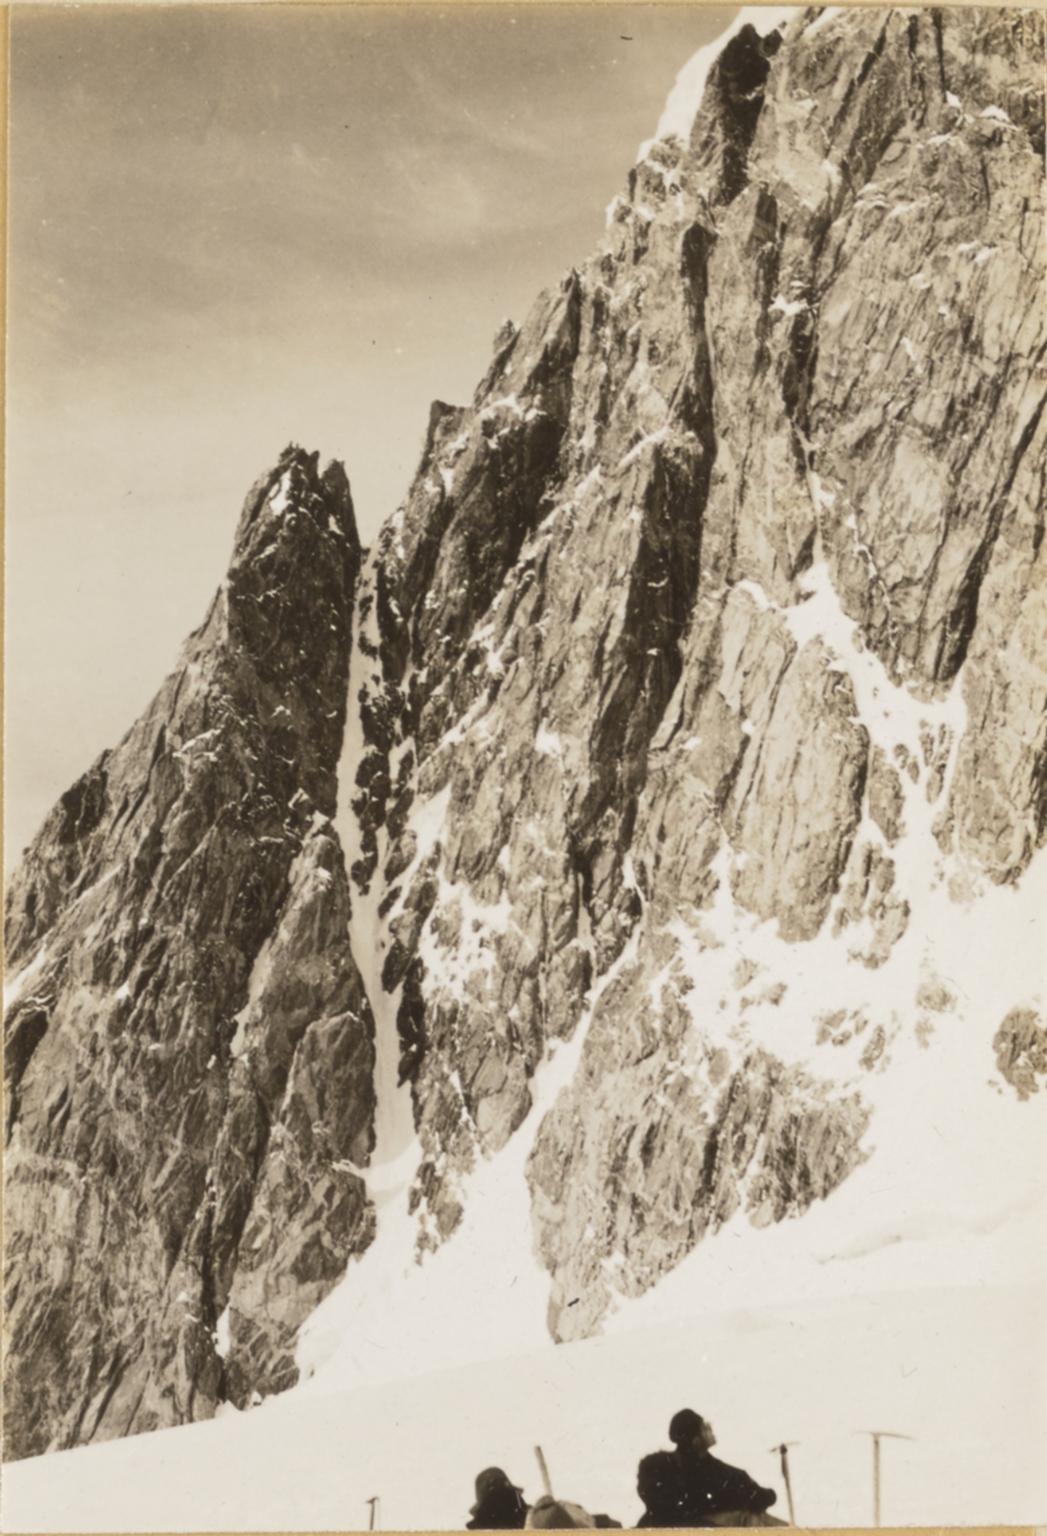 Mount Waddington, state unknown